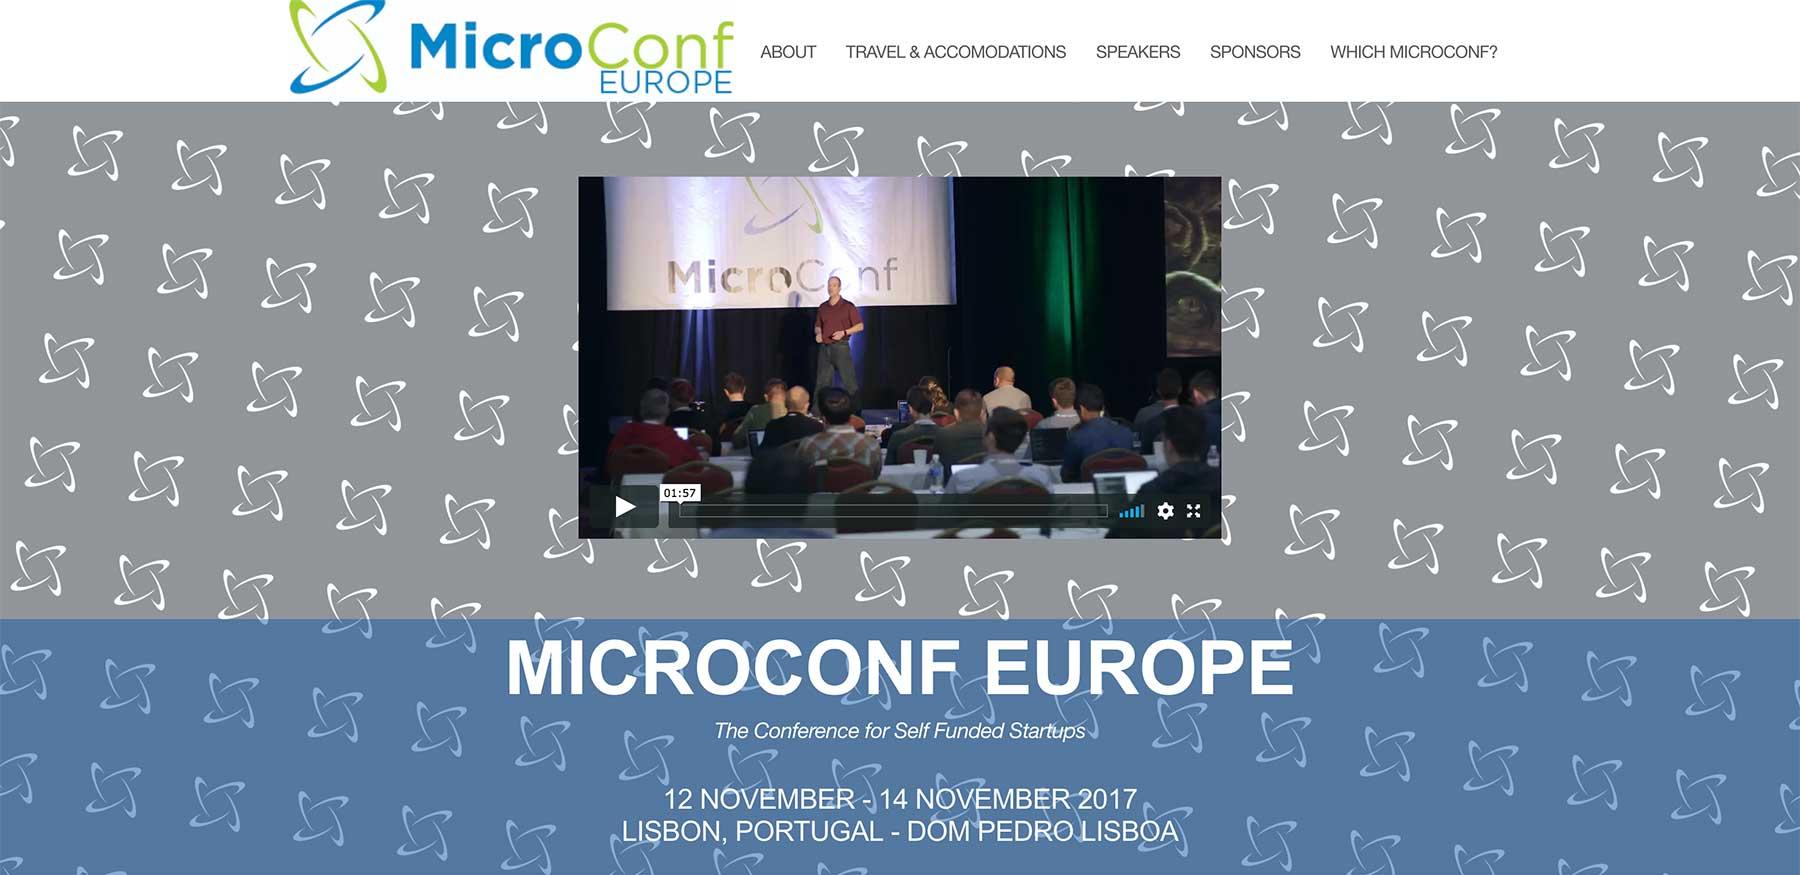 MicroConf Europe